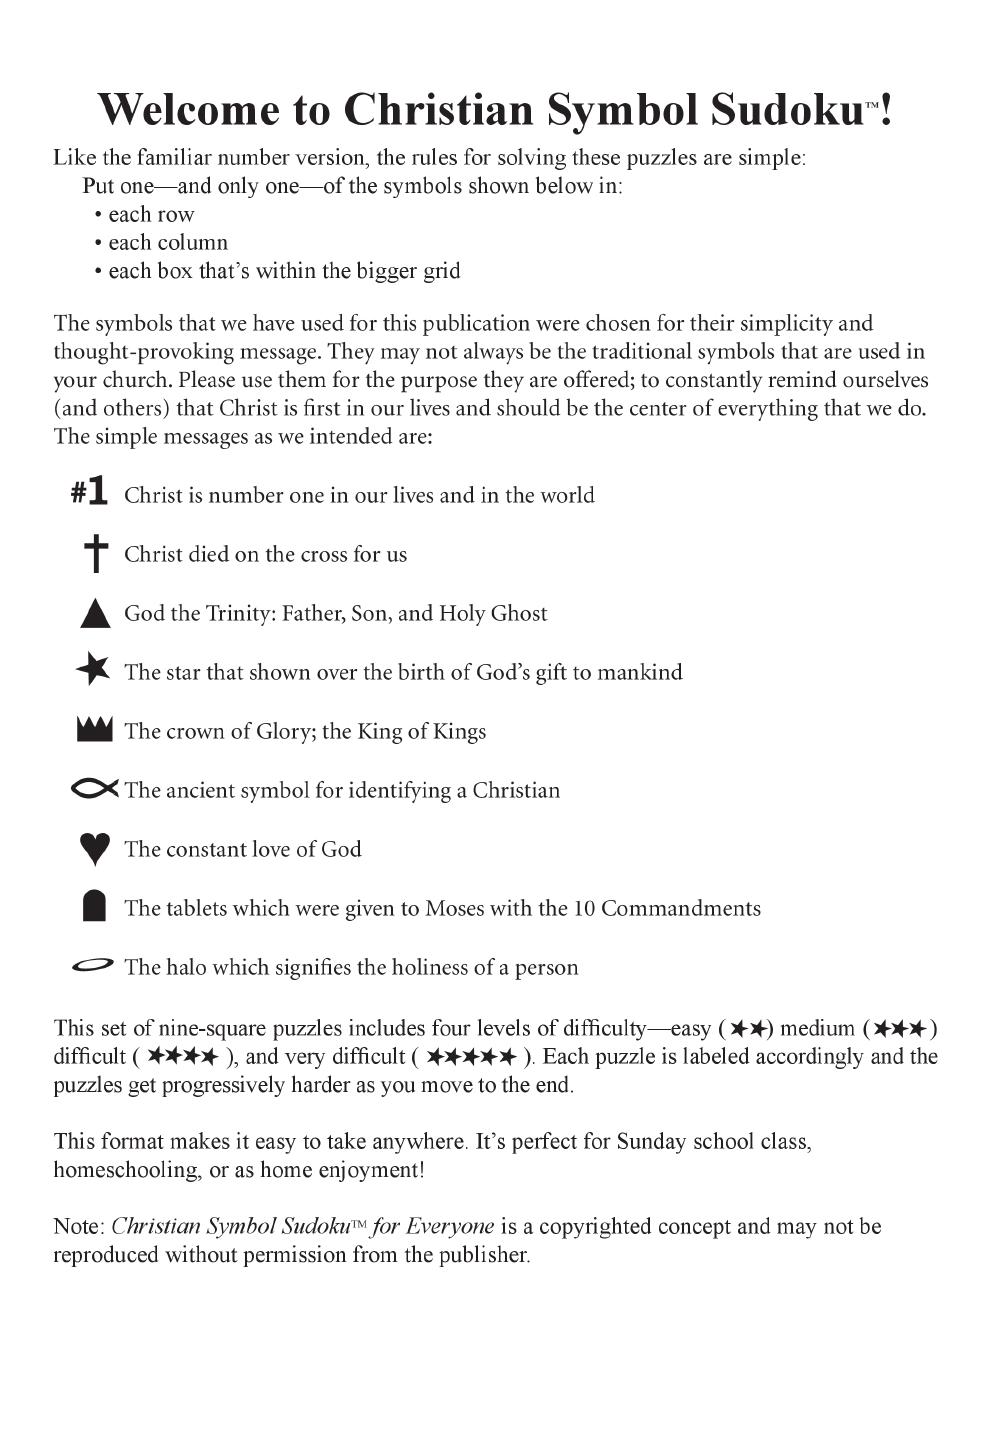 Christian Symbol Sudoku For Everyone Book Jw Pepper Sheet Music